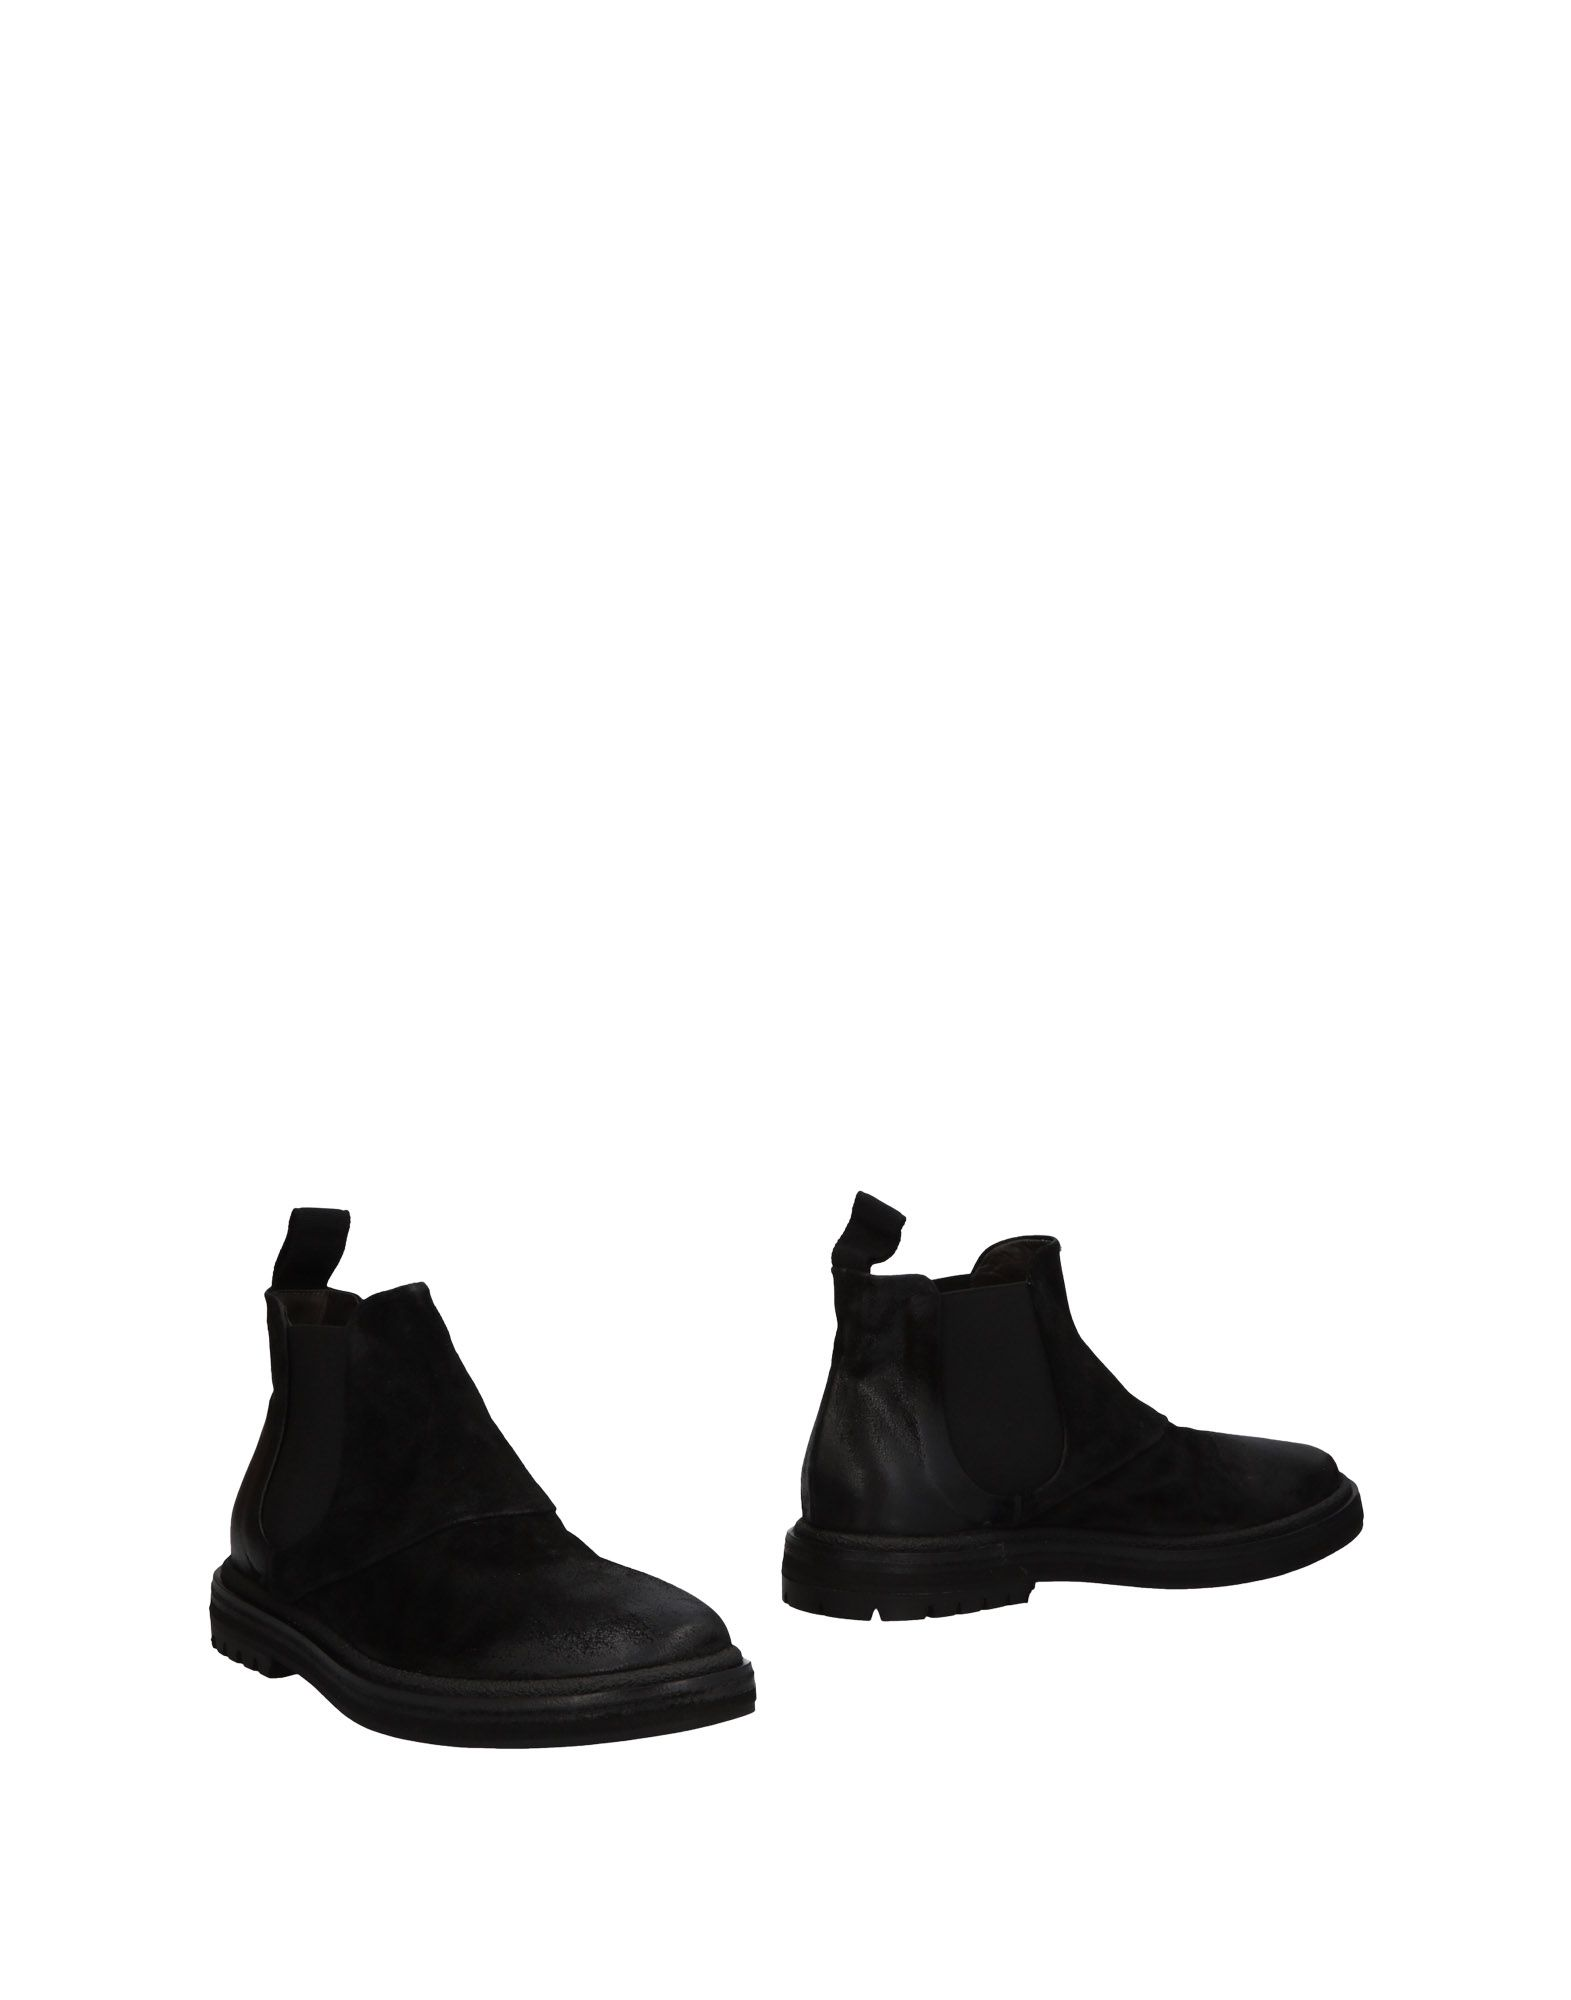 Marsèll 11476169JP Stiefelette Herren  11476169JP Marsèll Gute Qualität beliebte Schuhe 76cfe5